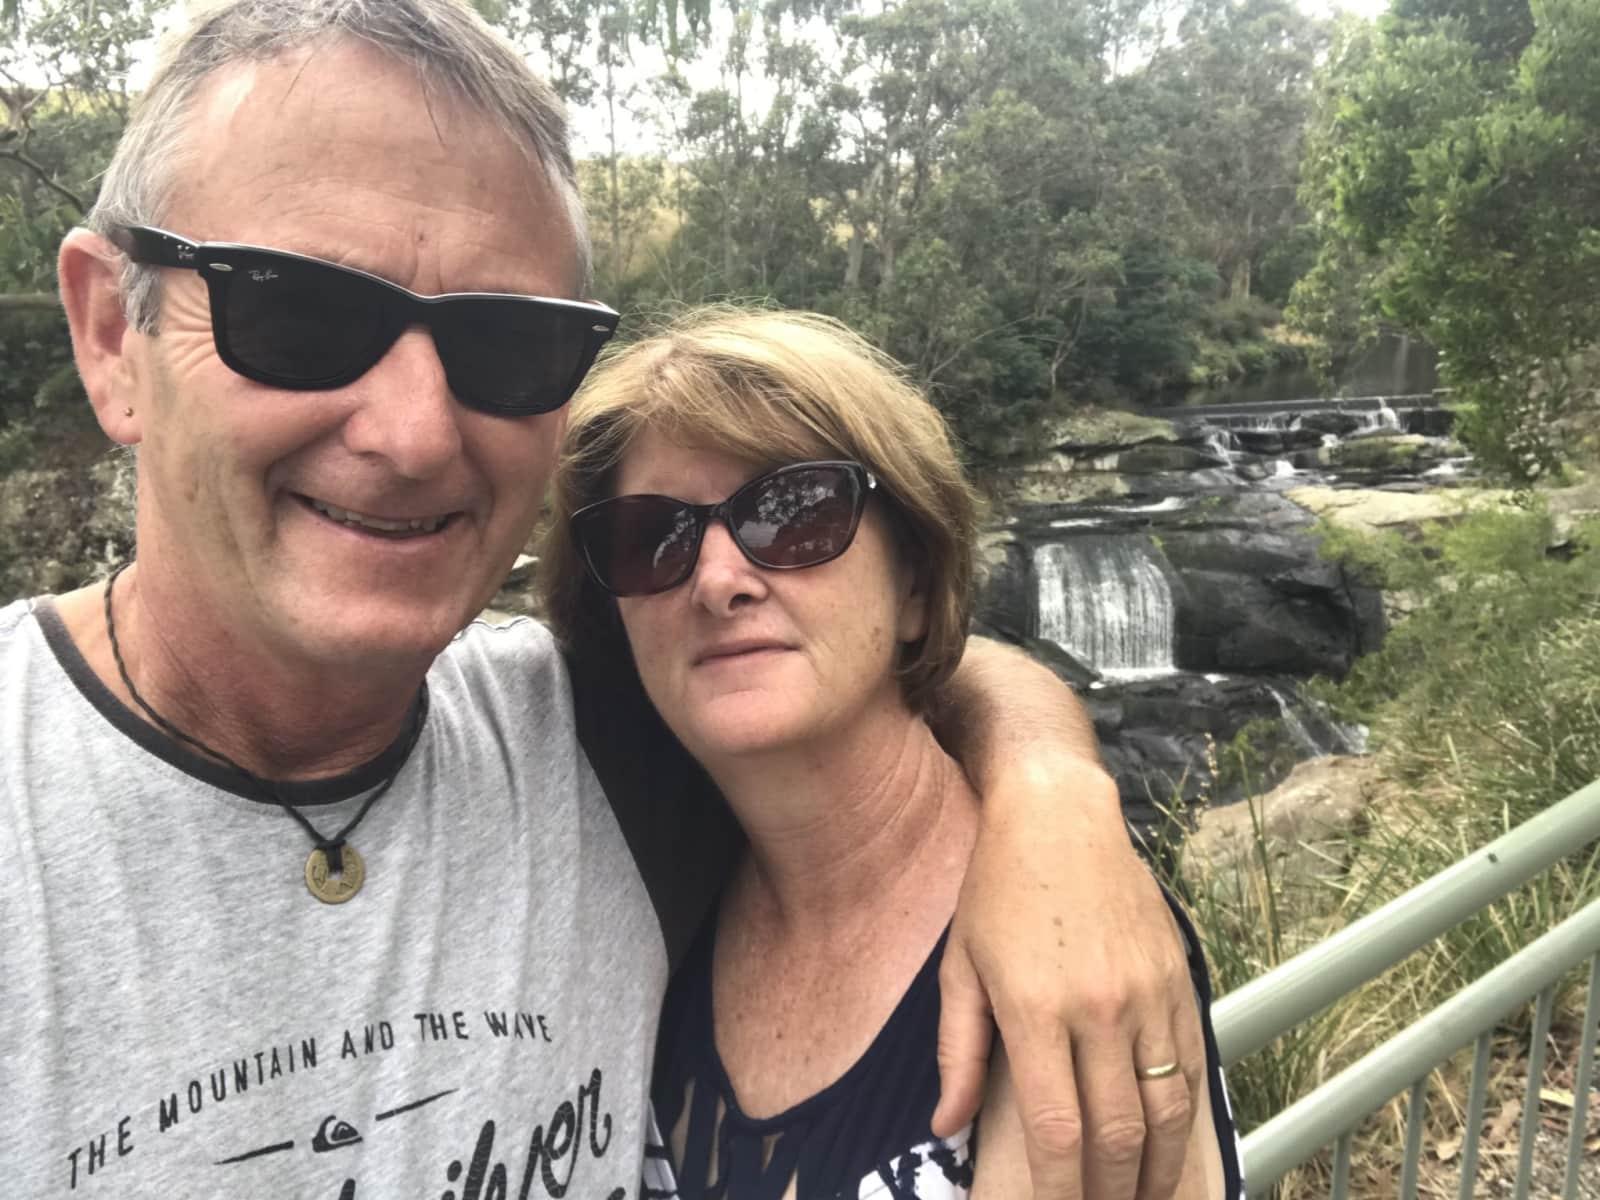 Scott & Kerrie from Melbourne, Victoria, Australia